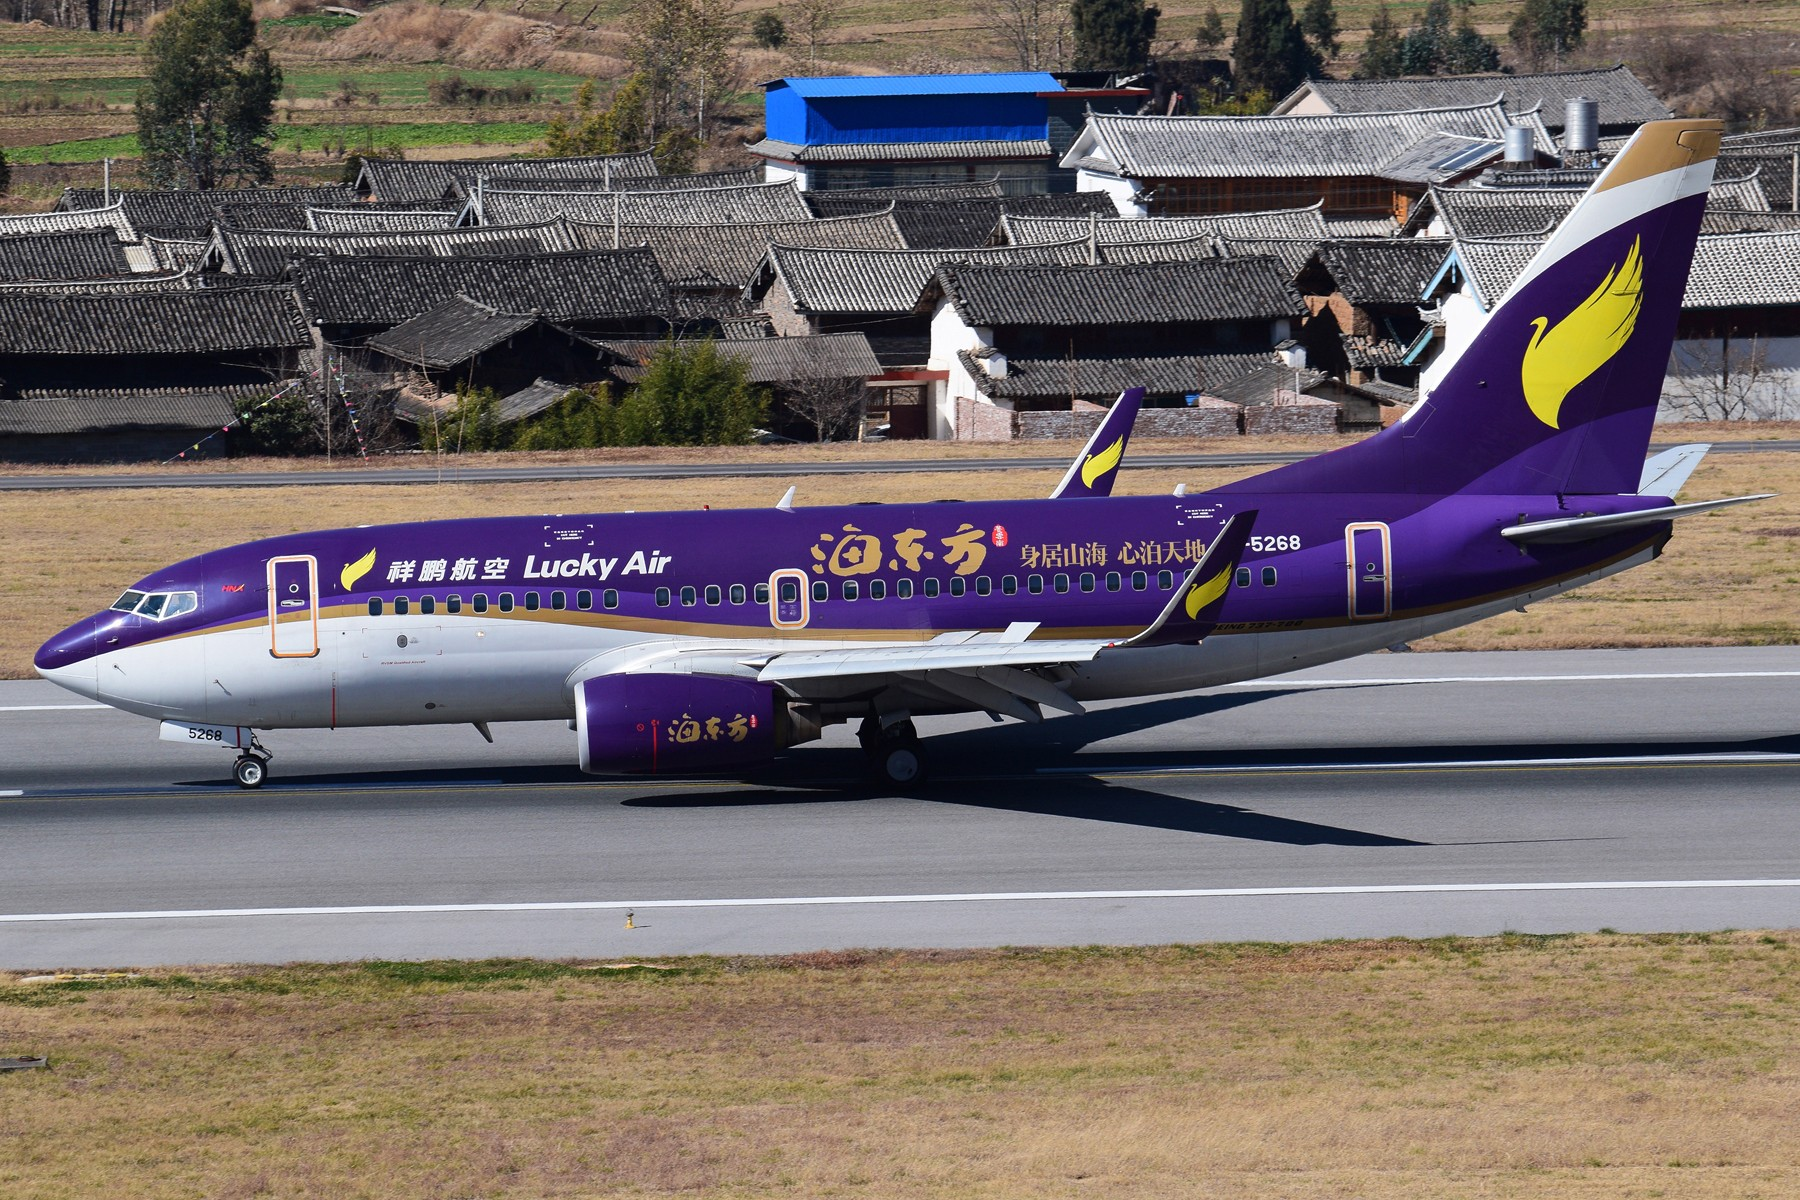 Re:[原创]补发的拍机游记---Day Trip for 丽江三义 BOEING 737-700 B-5268 中国丽江三义机场